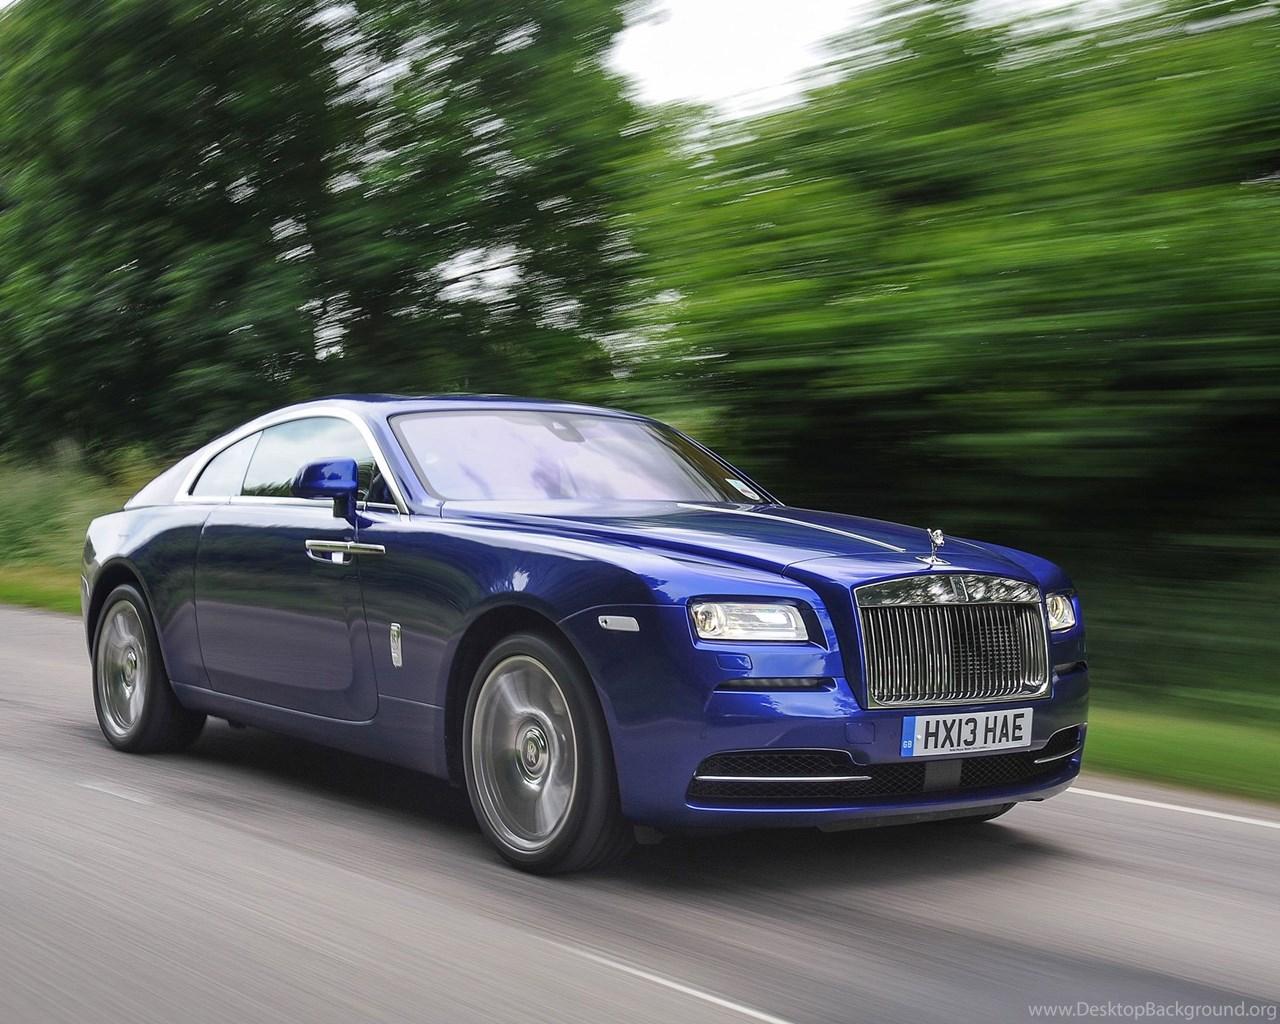 2015 Rolls Royce Wraith Las Vegas Wallpapers Desktop Background